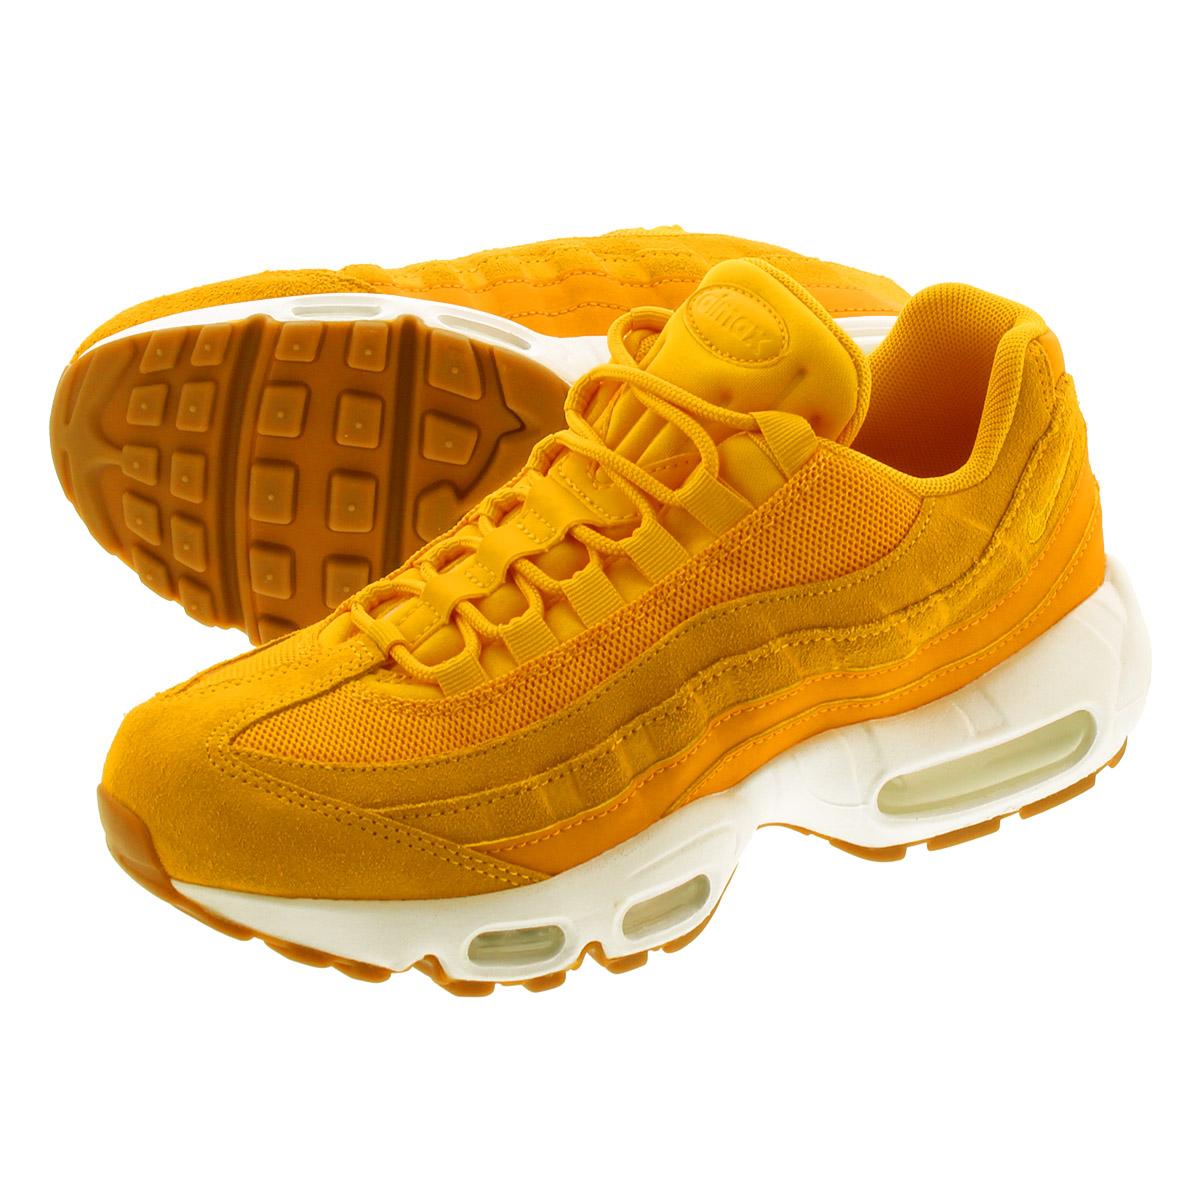 NIKE WMNS AIR MAX 95 PRM Nike women Air Max 95 premium UNIVERSITY GOLDCANYON GOLD 807,443 701